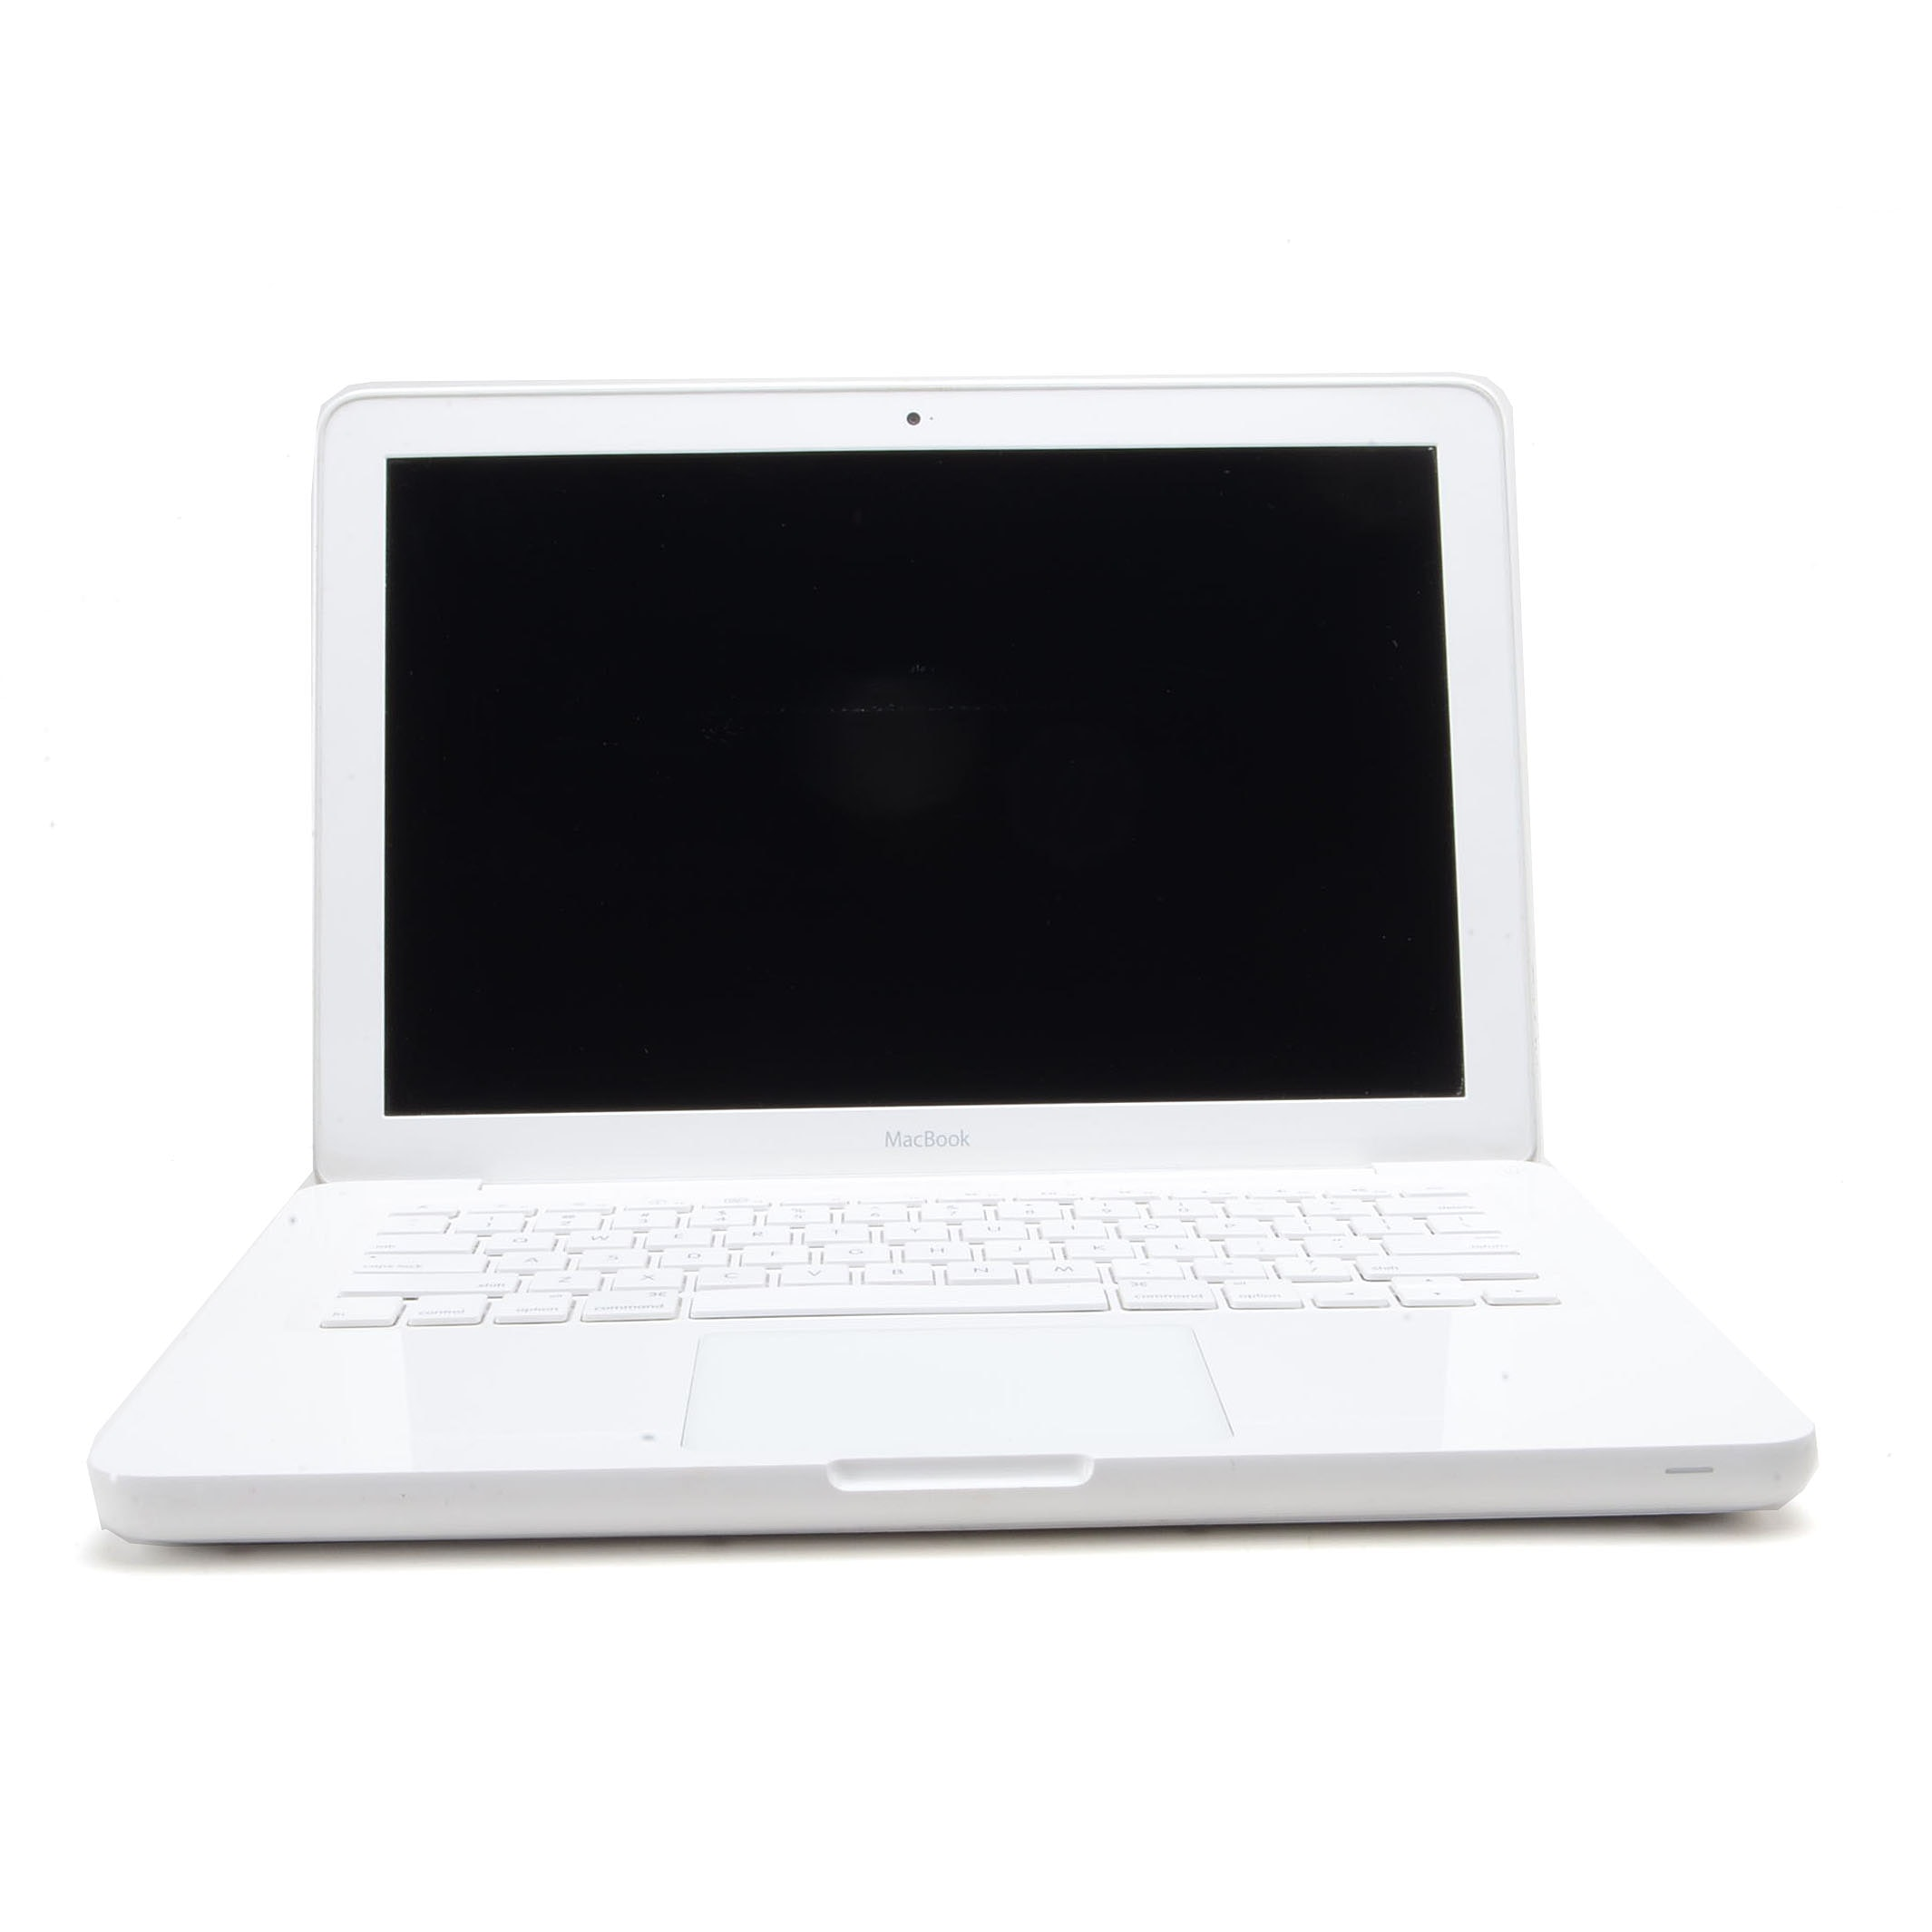 "13"" MacBook Laptop in White"